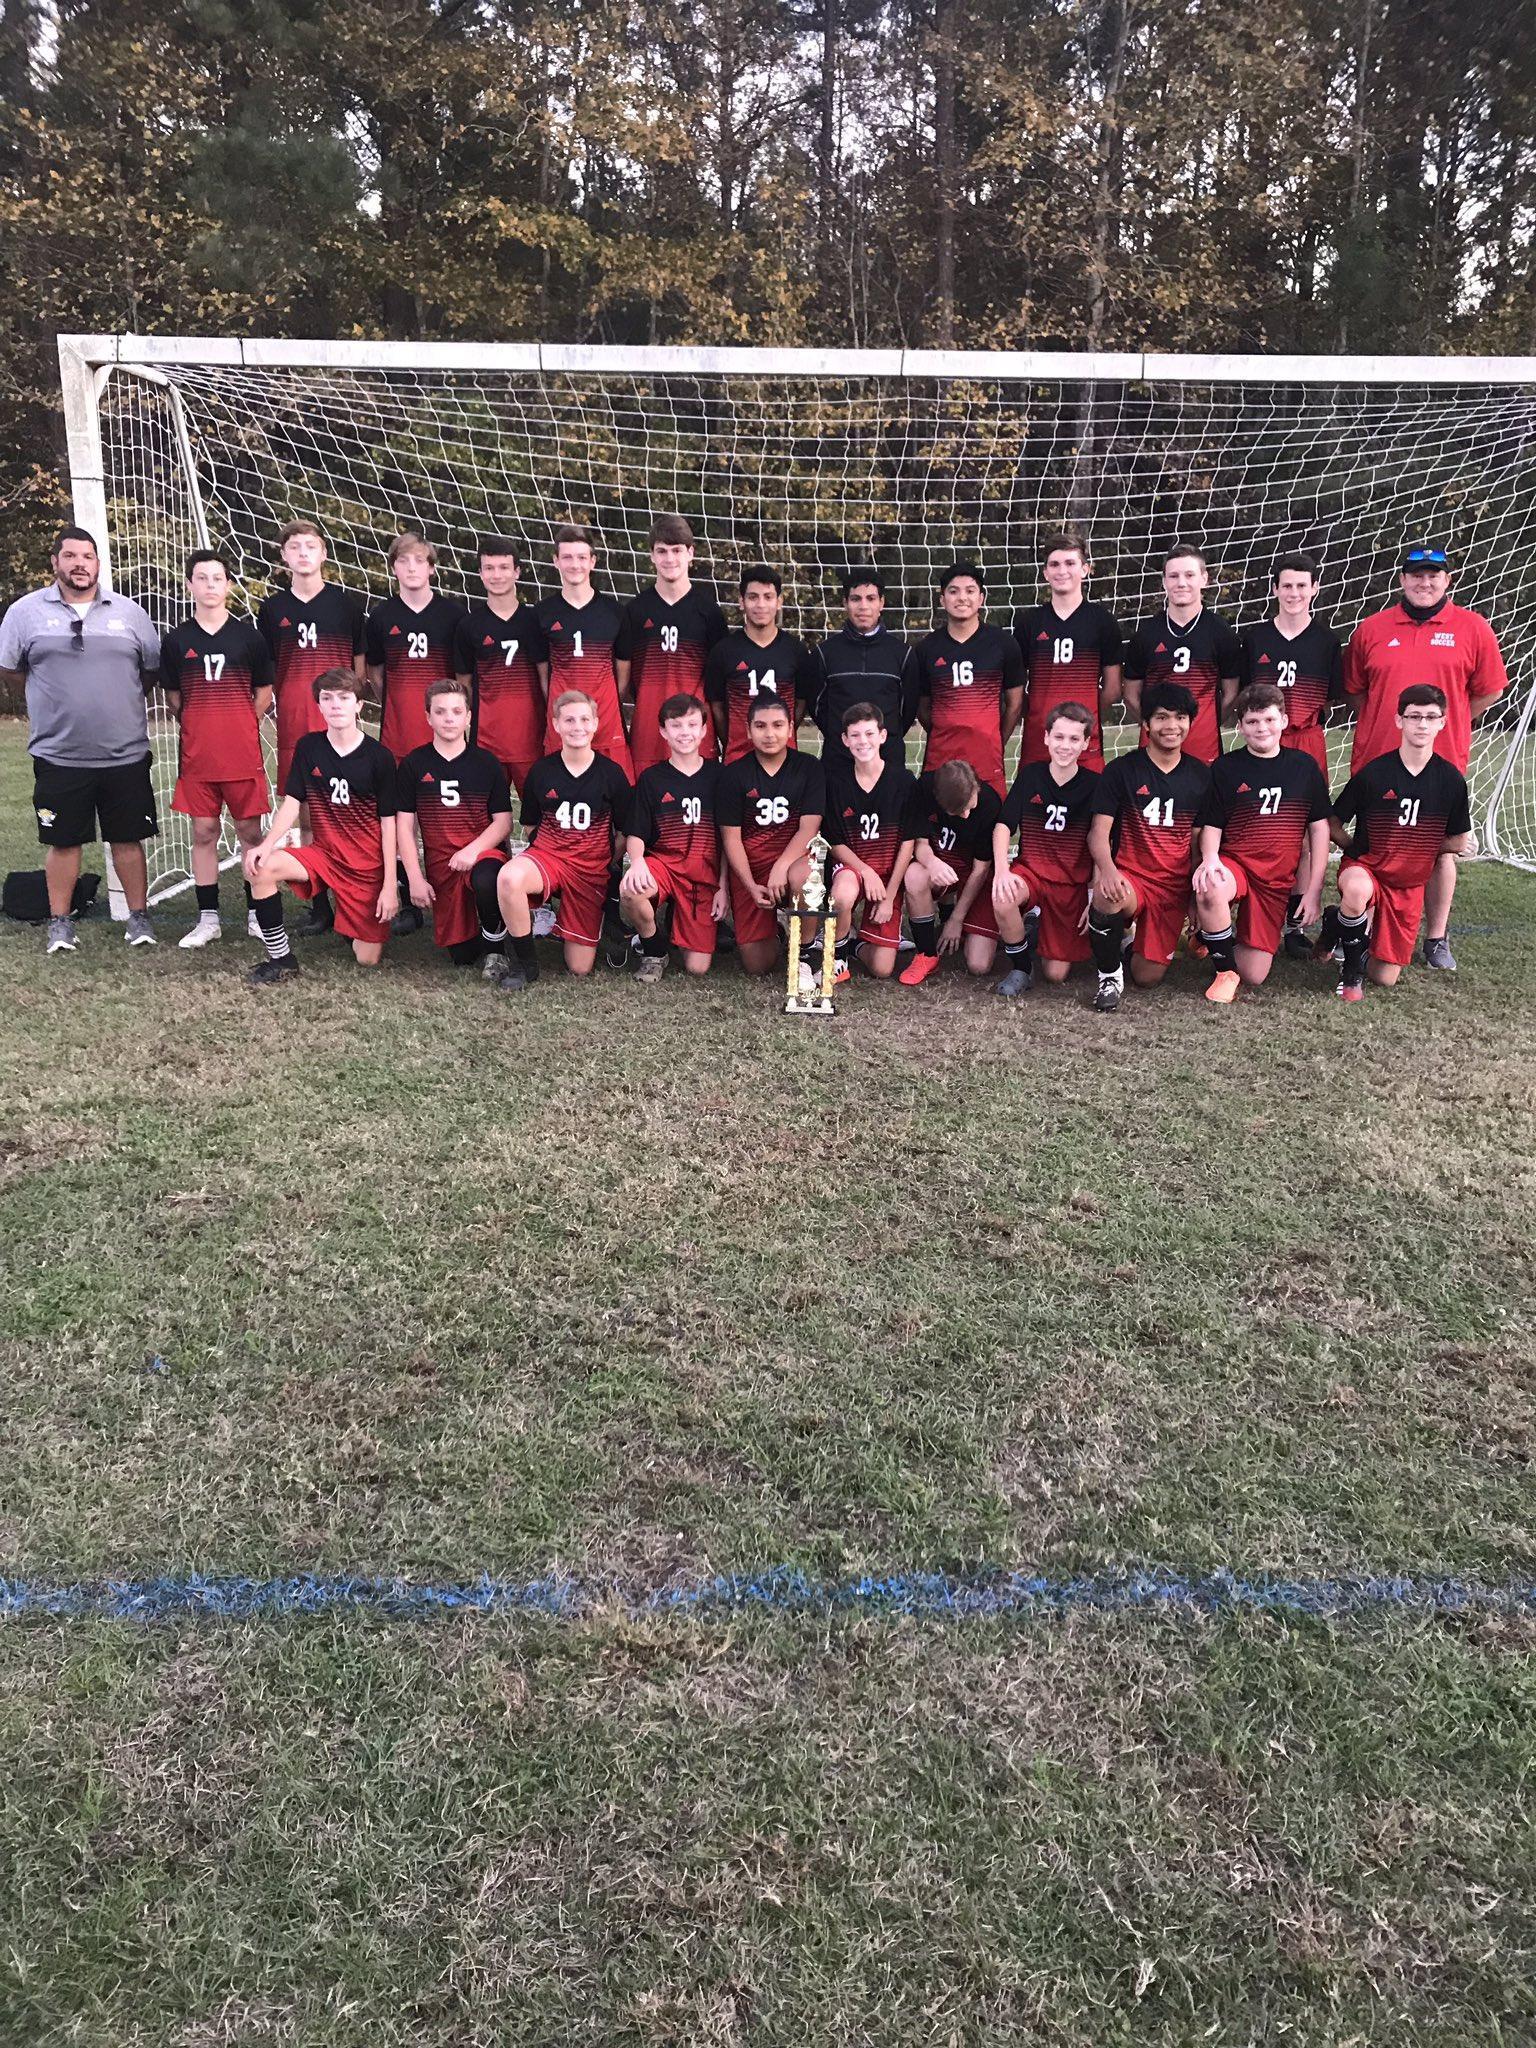 WLHS 2020 Boys Soccer Team